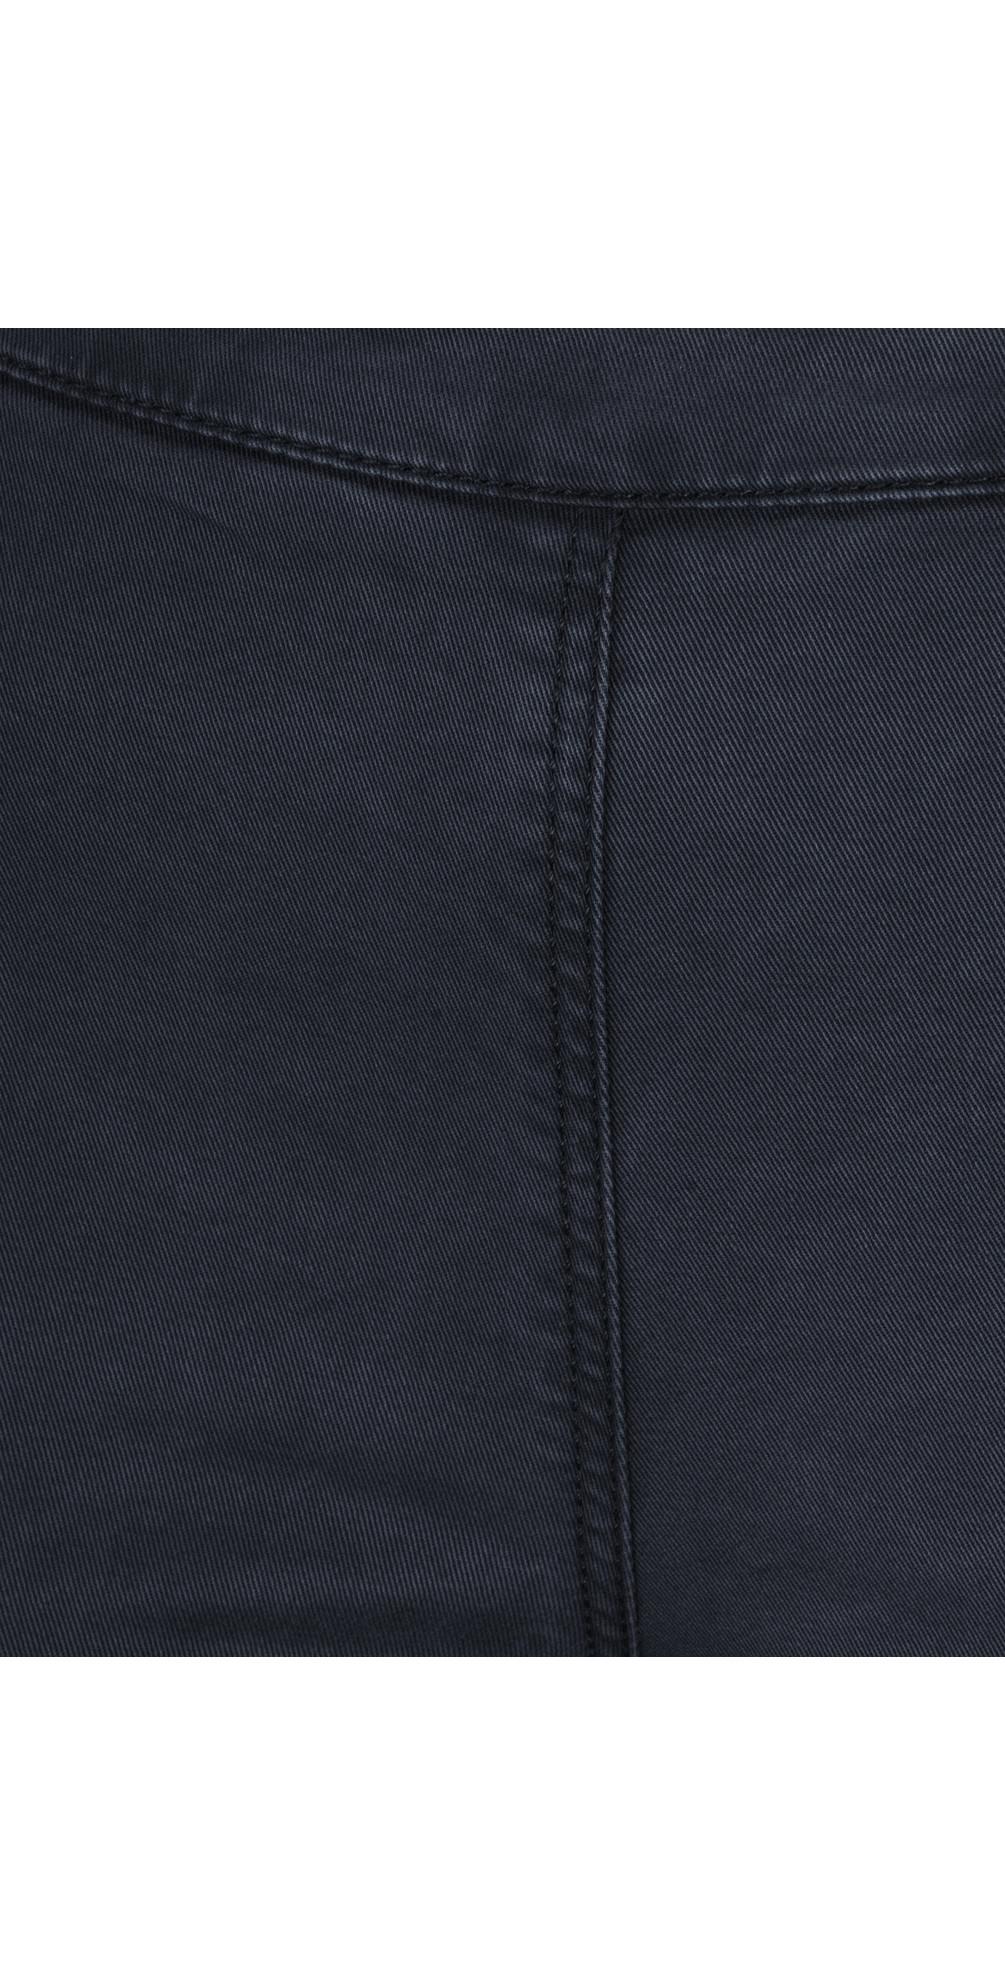 Essential Stretch Side Zip Tregging main image